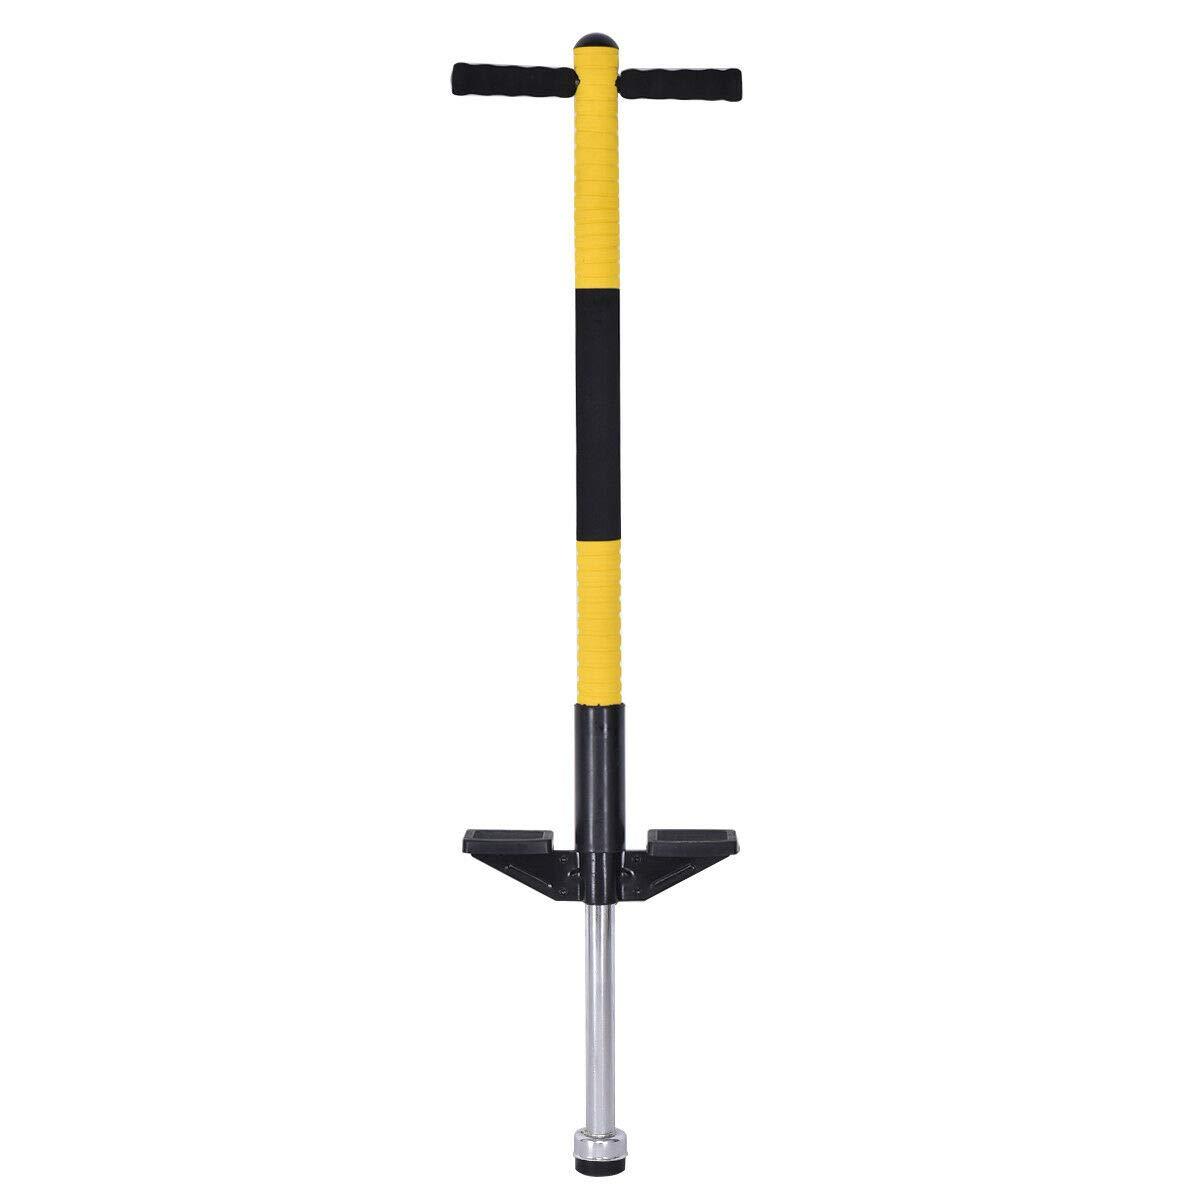 Globe House Products GHP Kids Green 38'' Hx10 W Heavy Duty Rugged Metal Frame Balance Training Pogo Stick